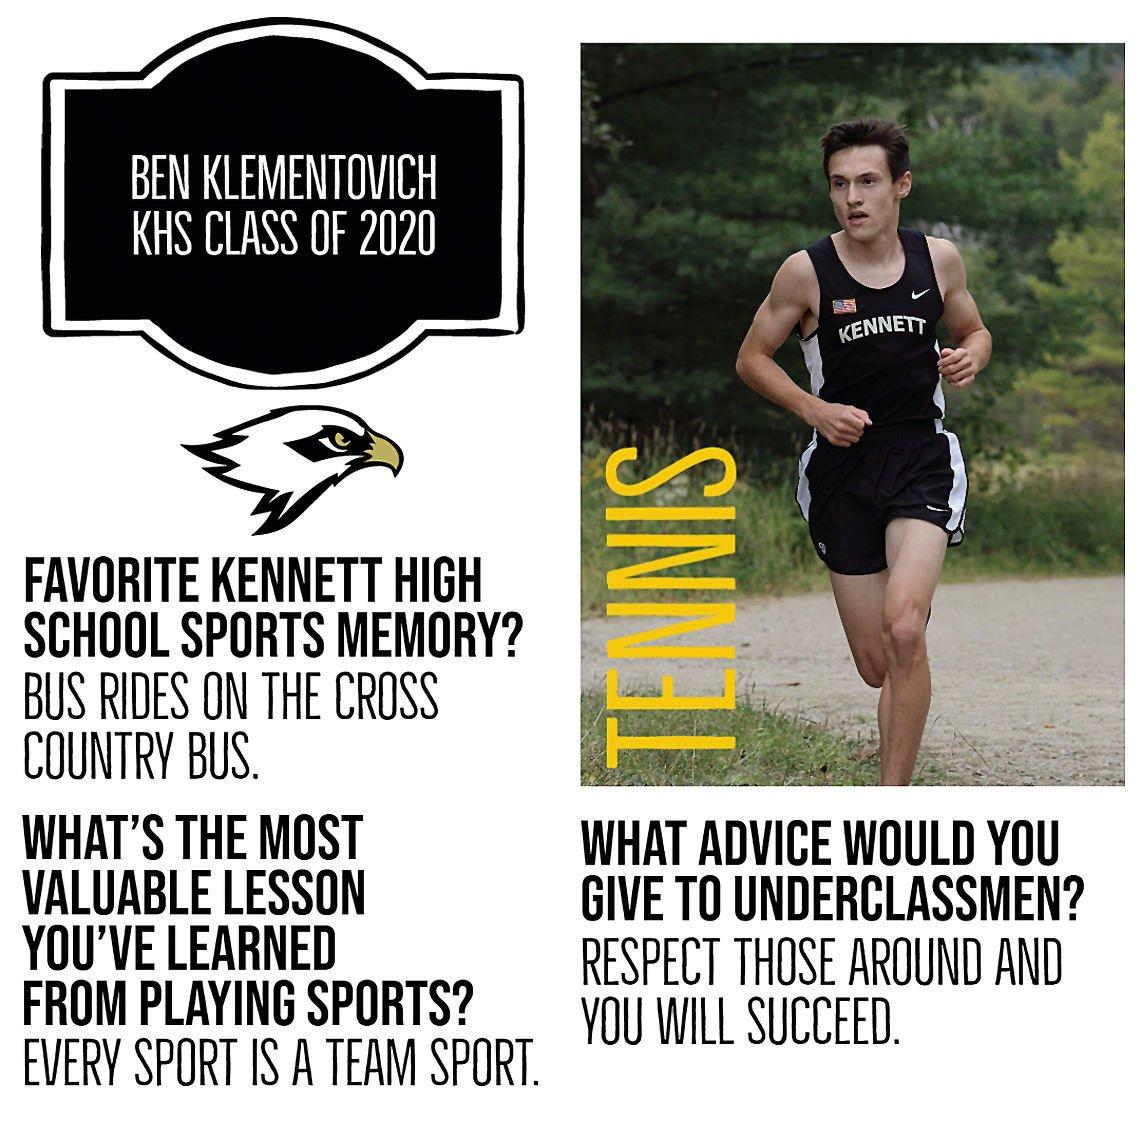 5-7-20 KHS Spotlight - Ben Klementovich - May 6.jpg